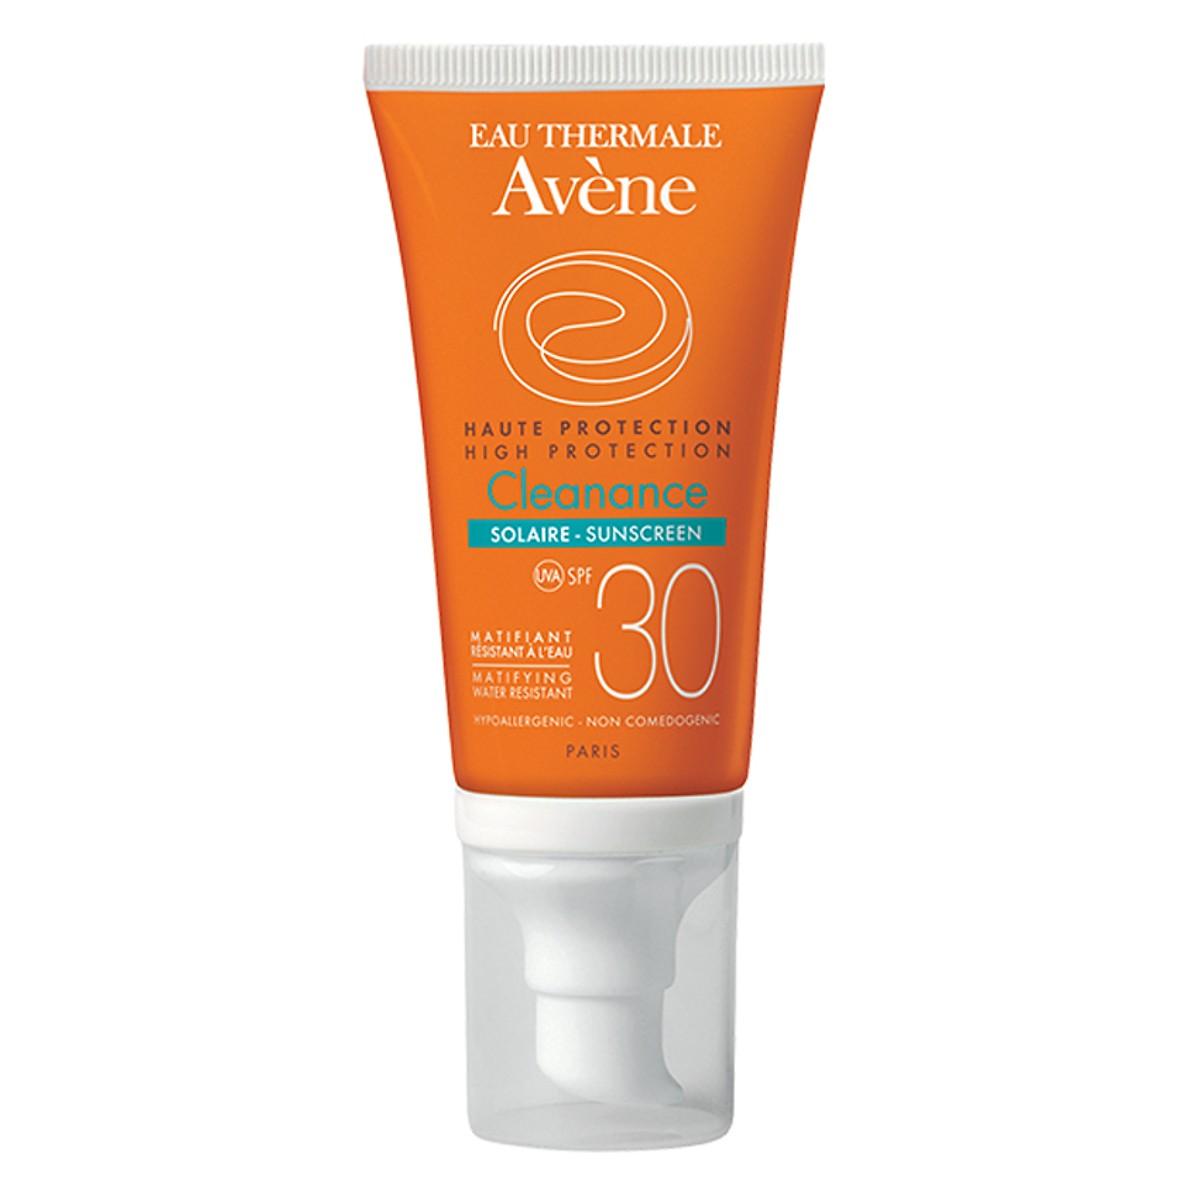 Chống Nắng Cho Da Nhờn, Mụn, Nhạy Cảm Avene Protection Cleanance Sunscreen SPF30 50ml - A1ASS2 - 100